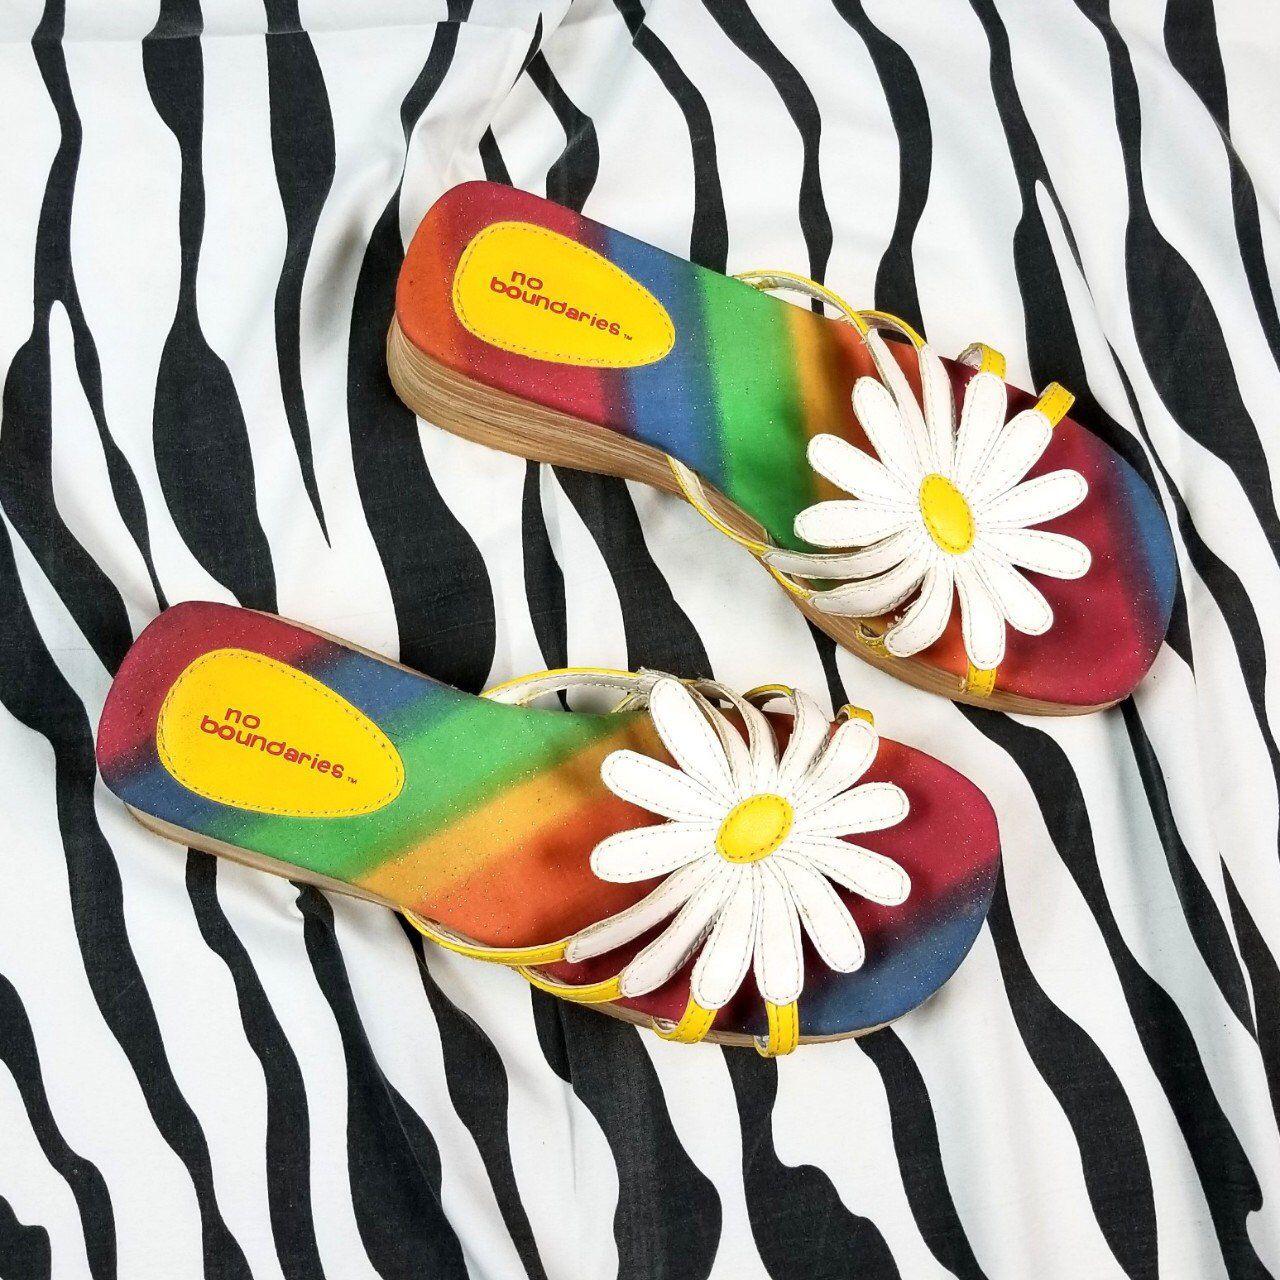 0f78c0fb5c5 Pin by Maddi on depop in 2019 | Depop, Flip Flops, Sandals